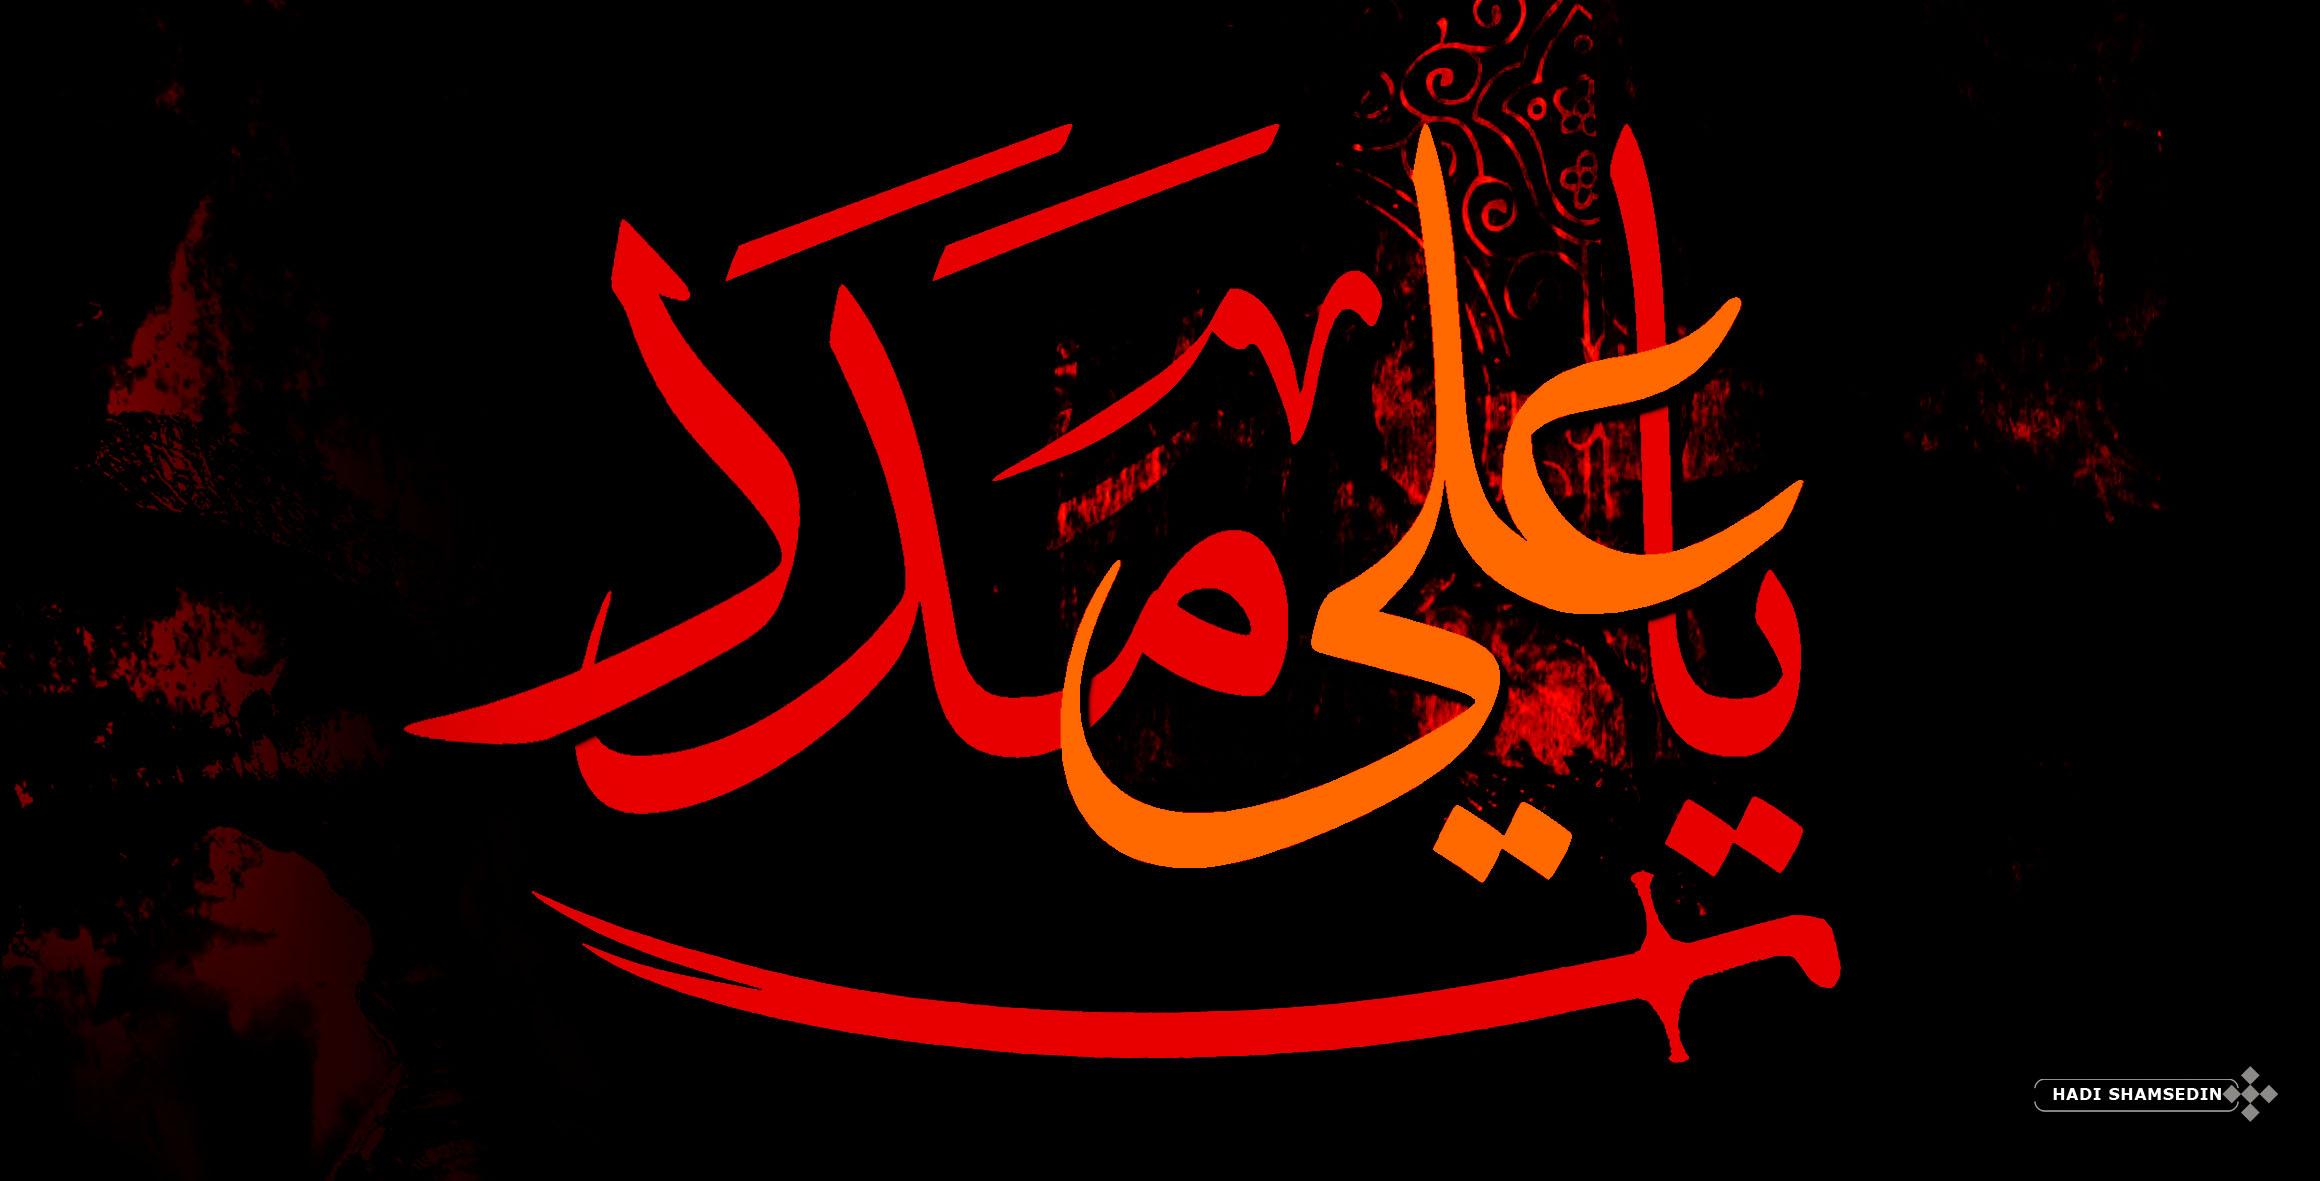 Ya ali madad by hadishamsedin on deviantart - Ya ali madad wallpaper ...